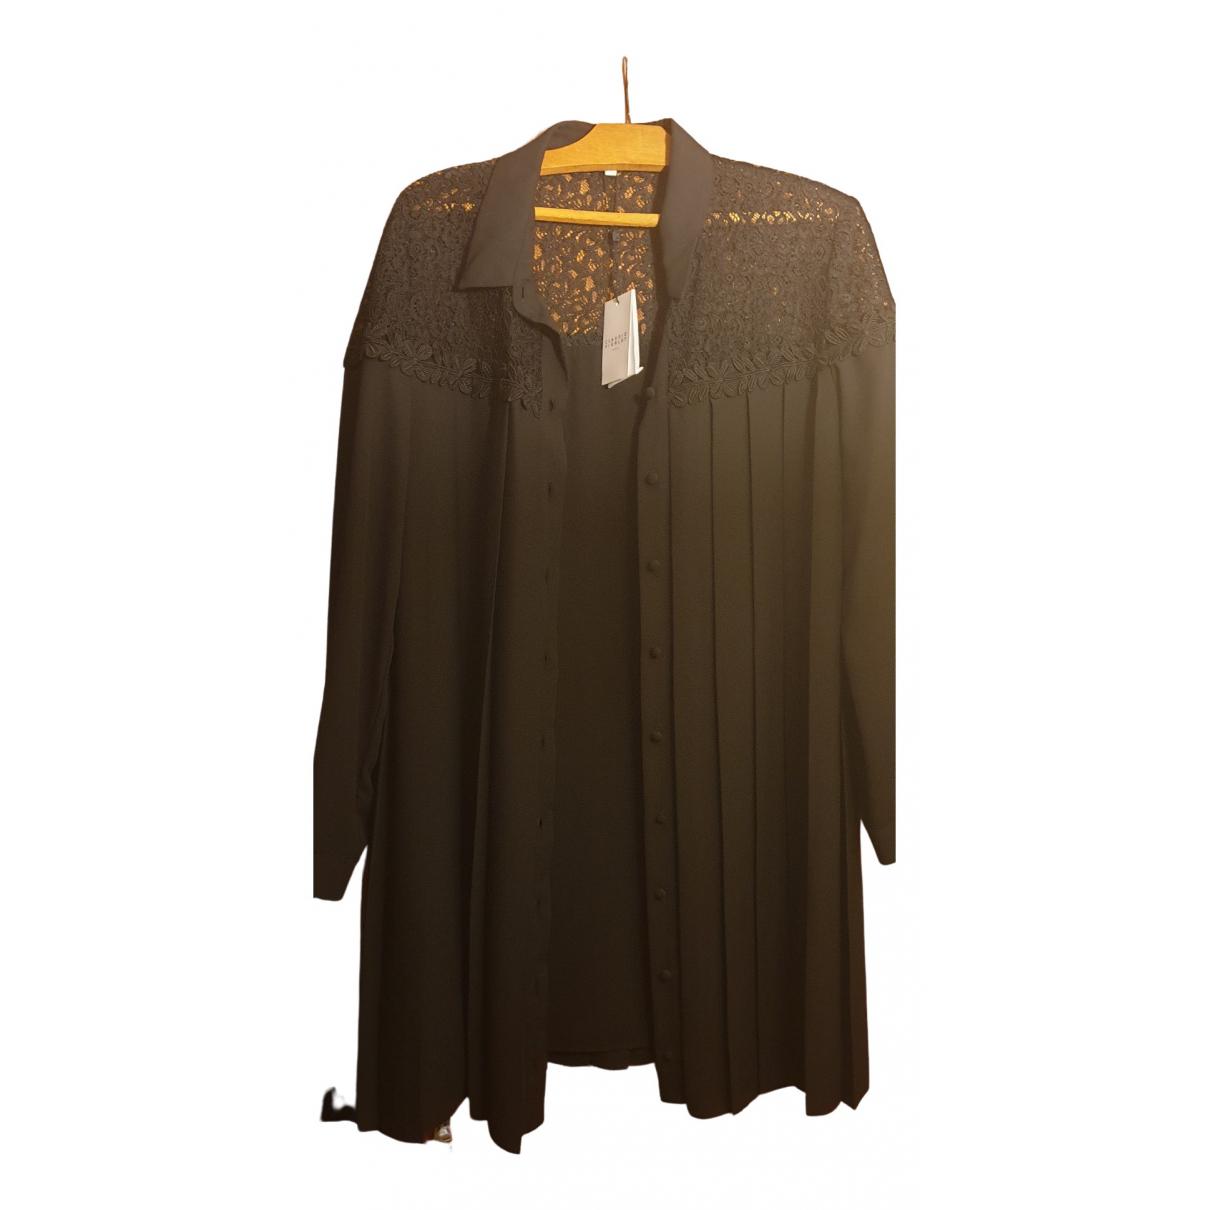 Claudie Pierlot Fall Winter 2019 Black dress for Women 40 FR